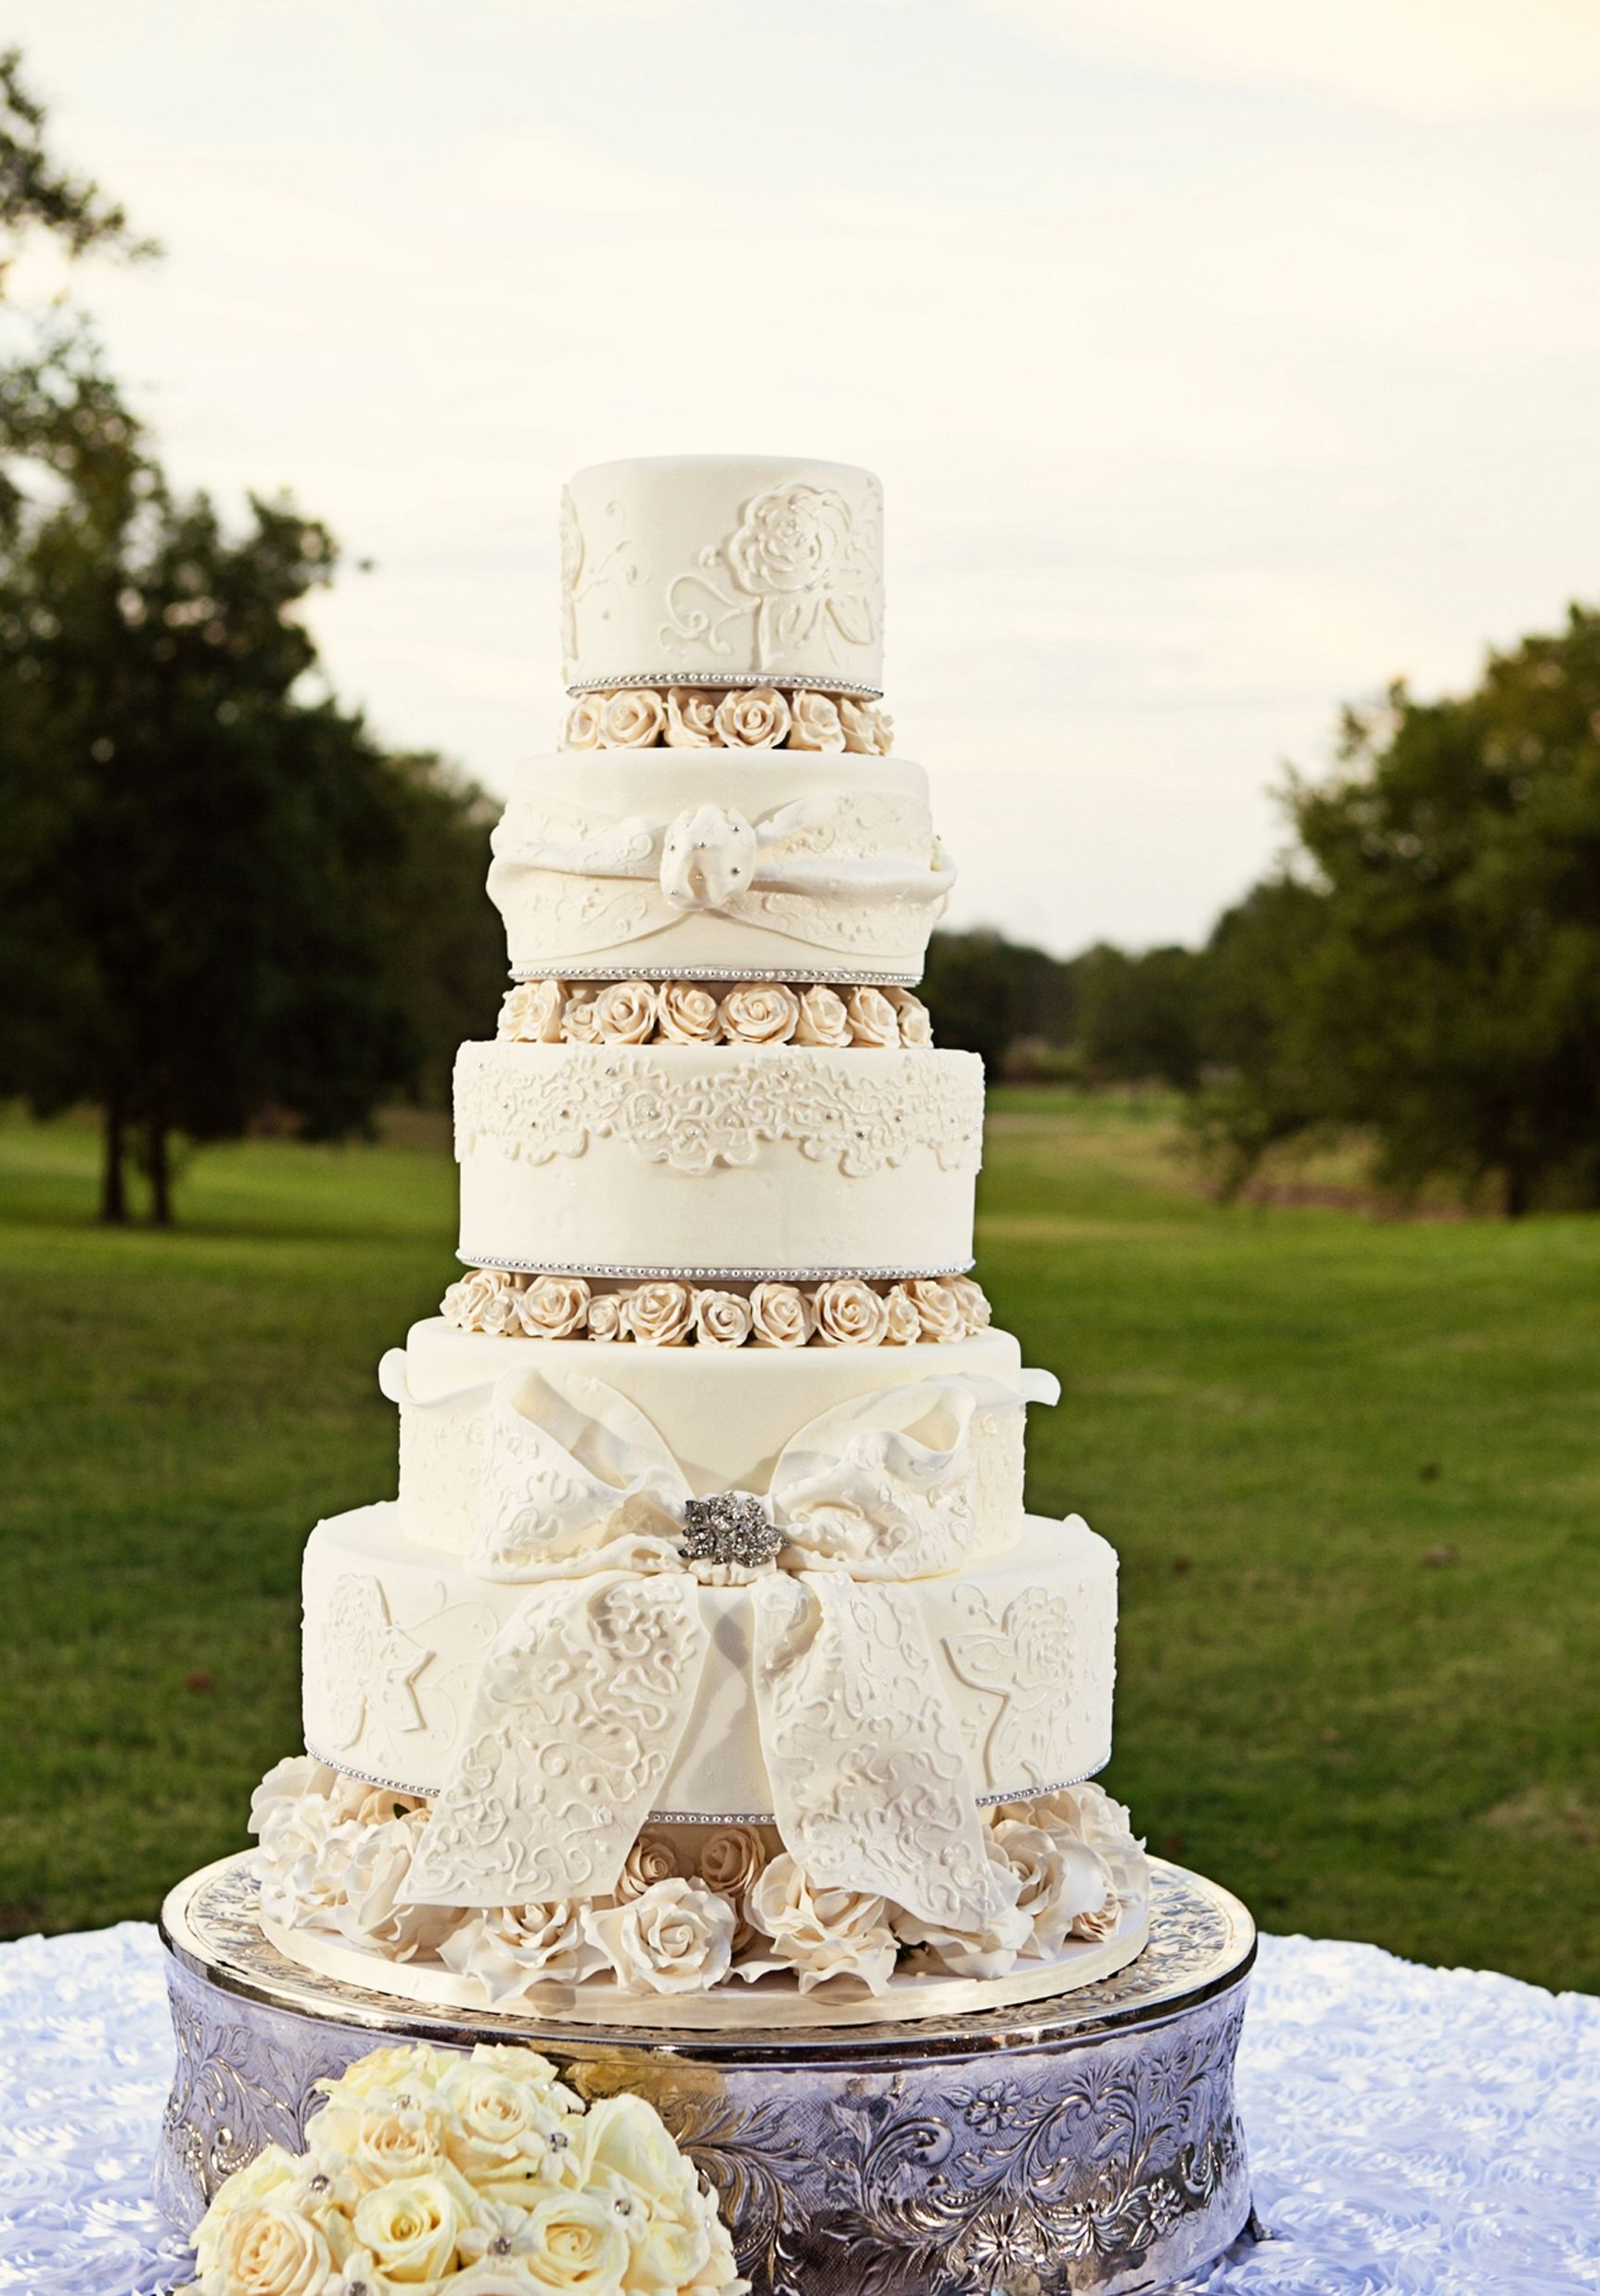 Famous Wedding Cakes Beaumont Texas Motif - Wedding Idea 2018 ...